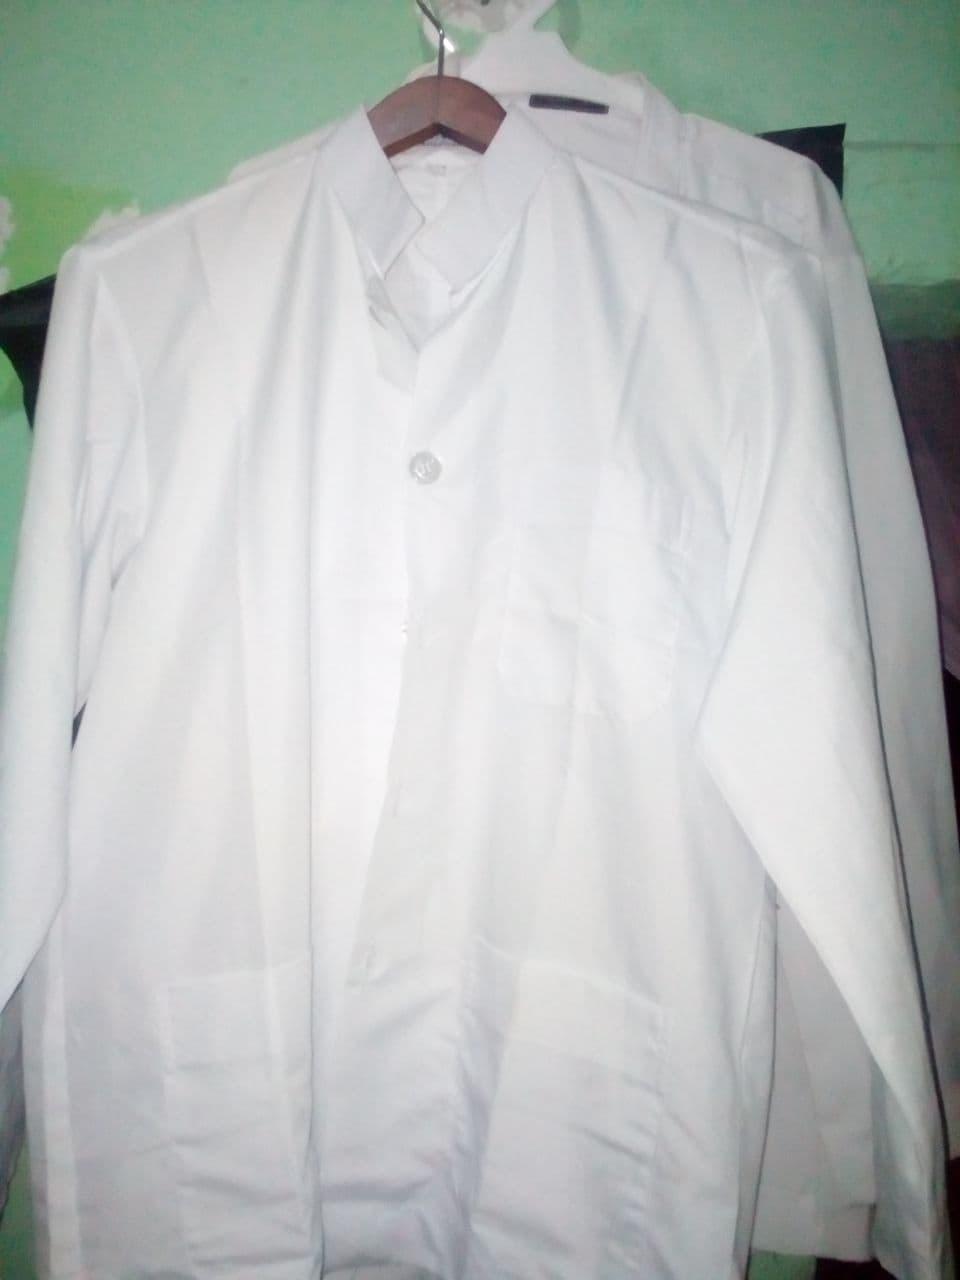 Koko Habaib Murah 1 Kodi - Putih, M